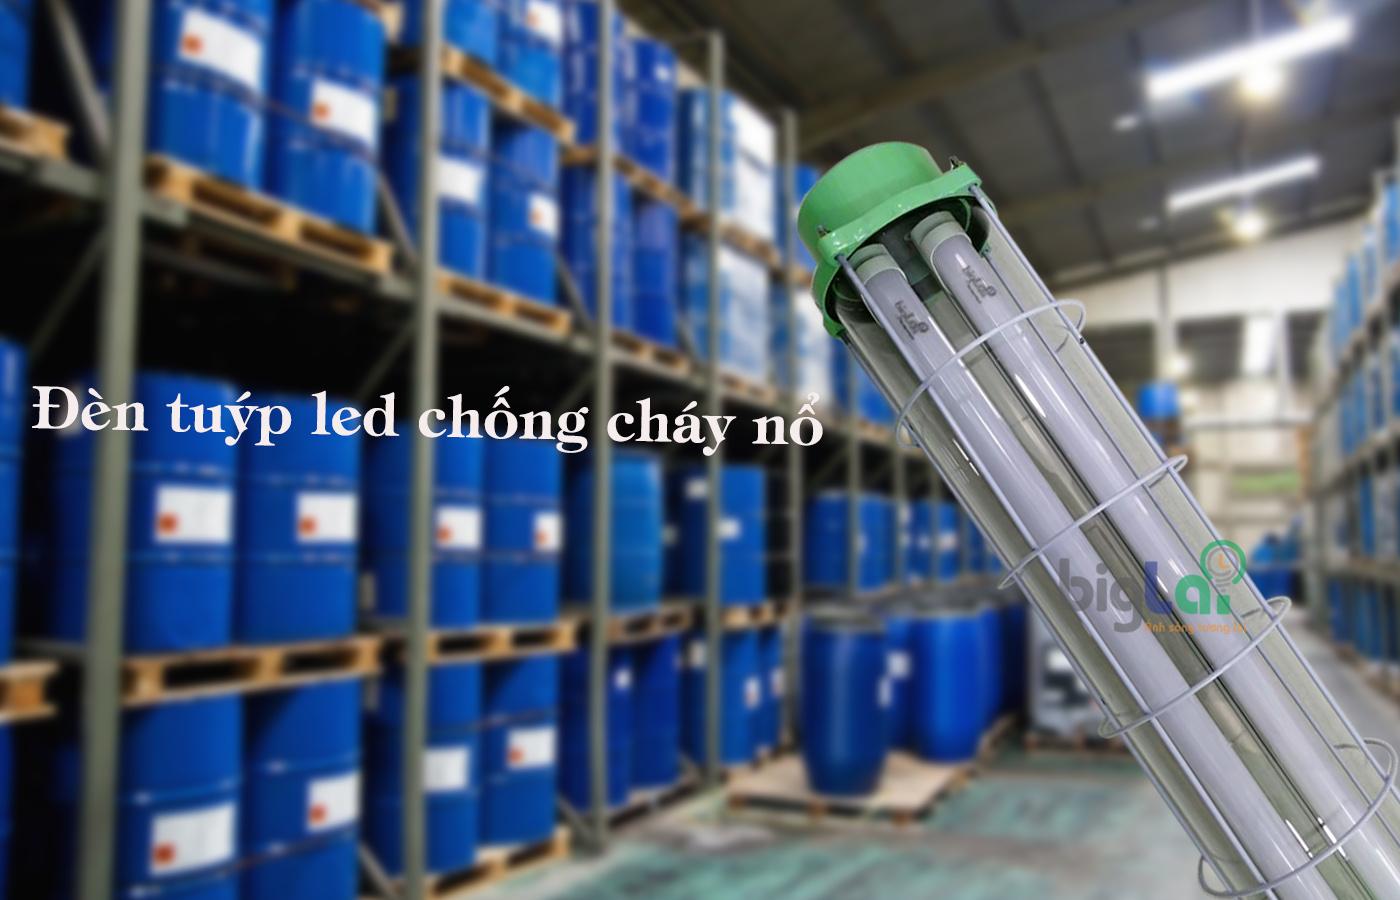 den-tuyp-chong-chay-no-biglai